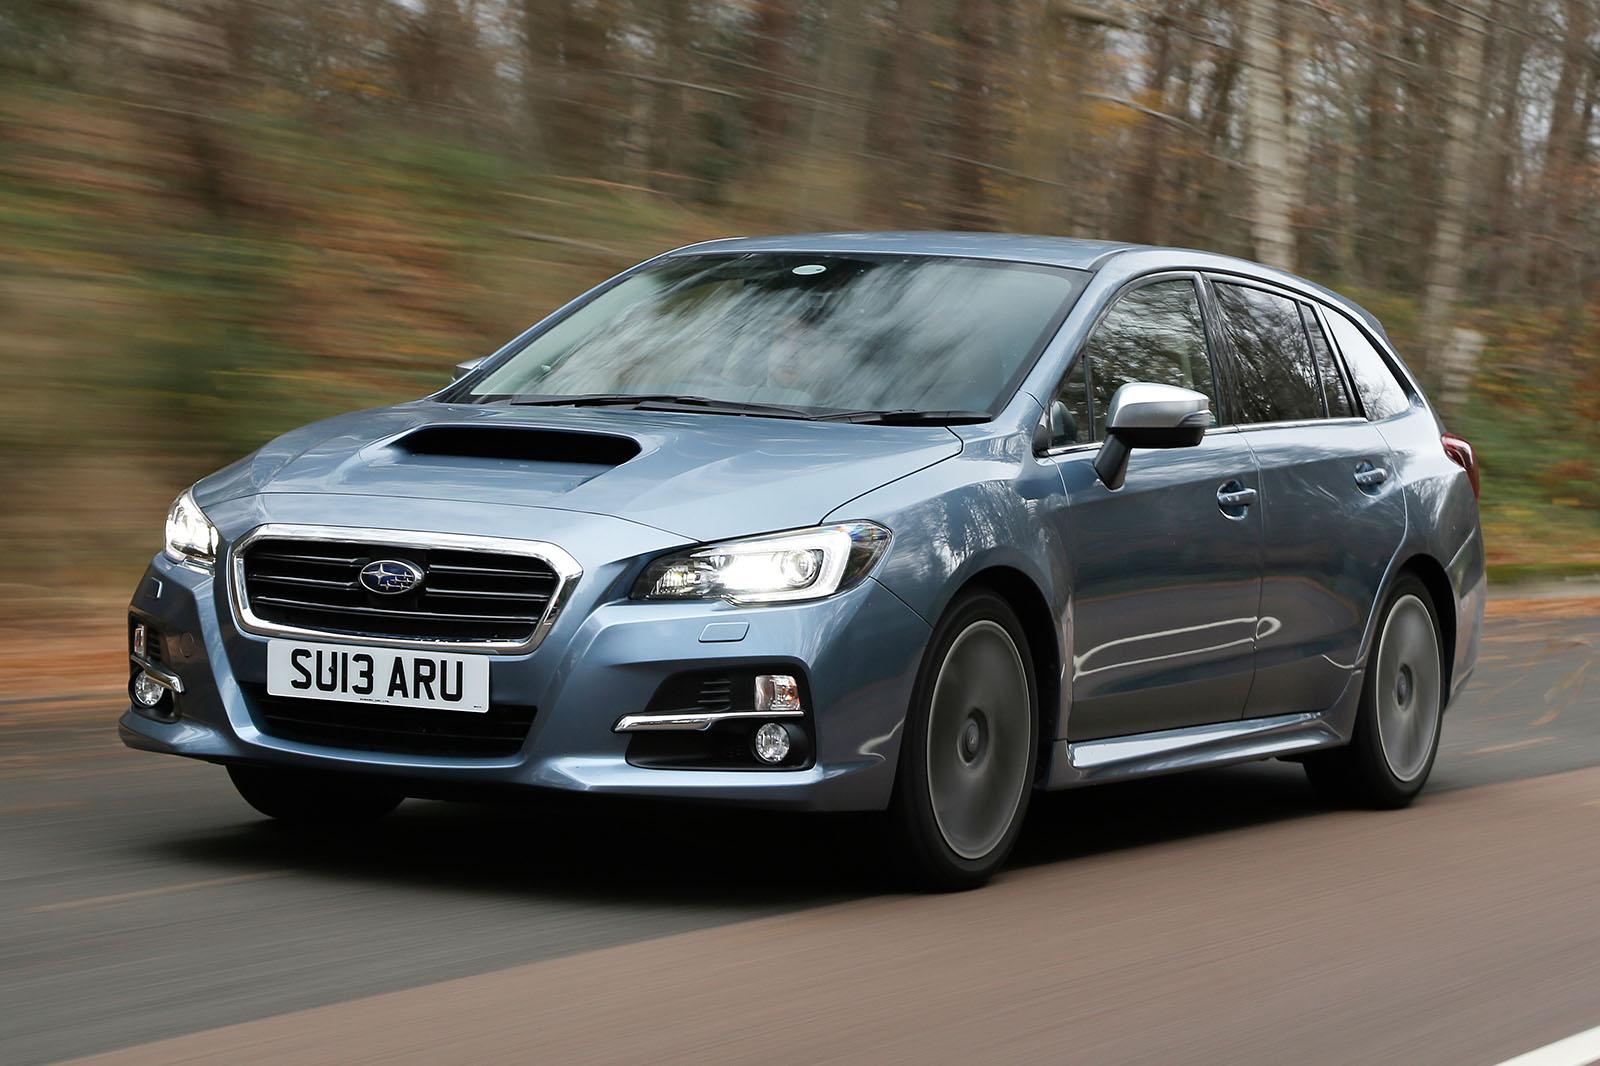 Subaru subaru pictures : Subaru Reviews | Autocar